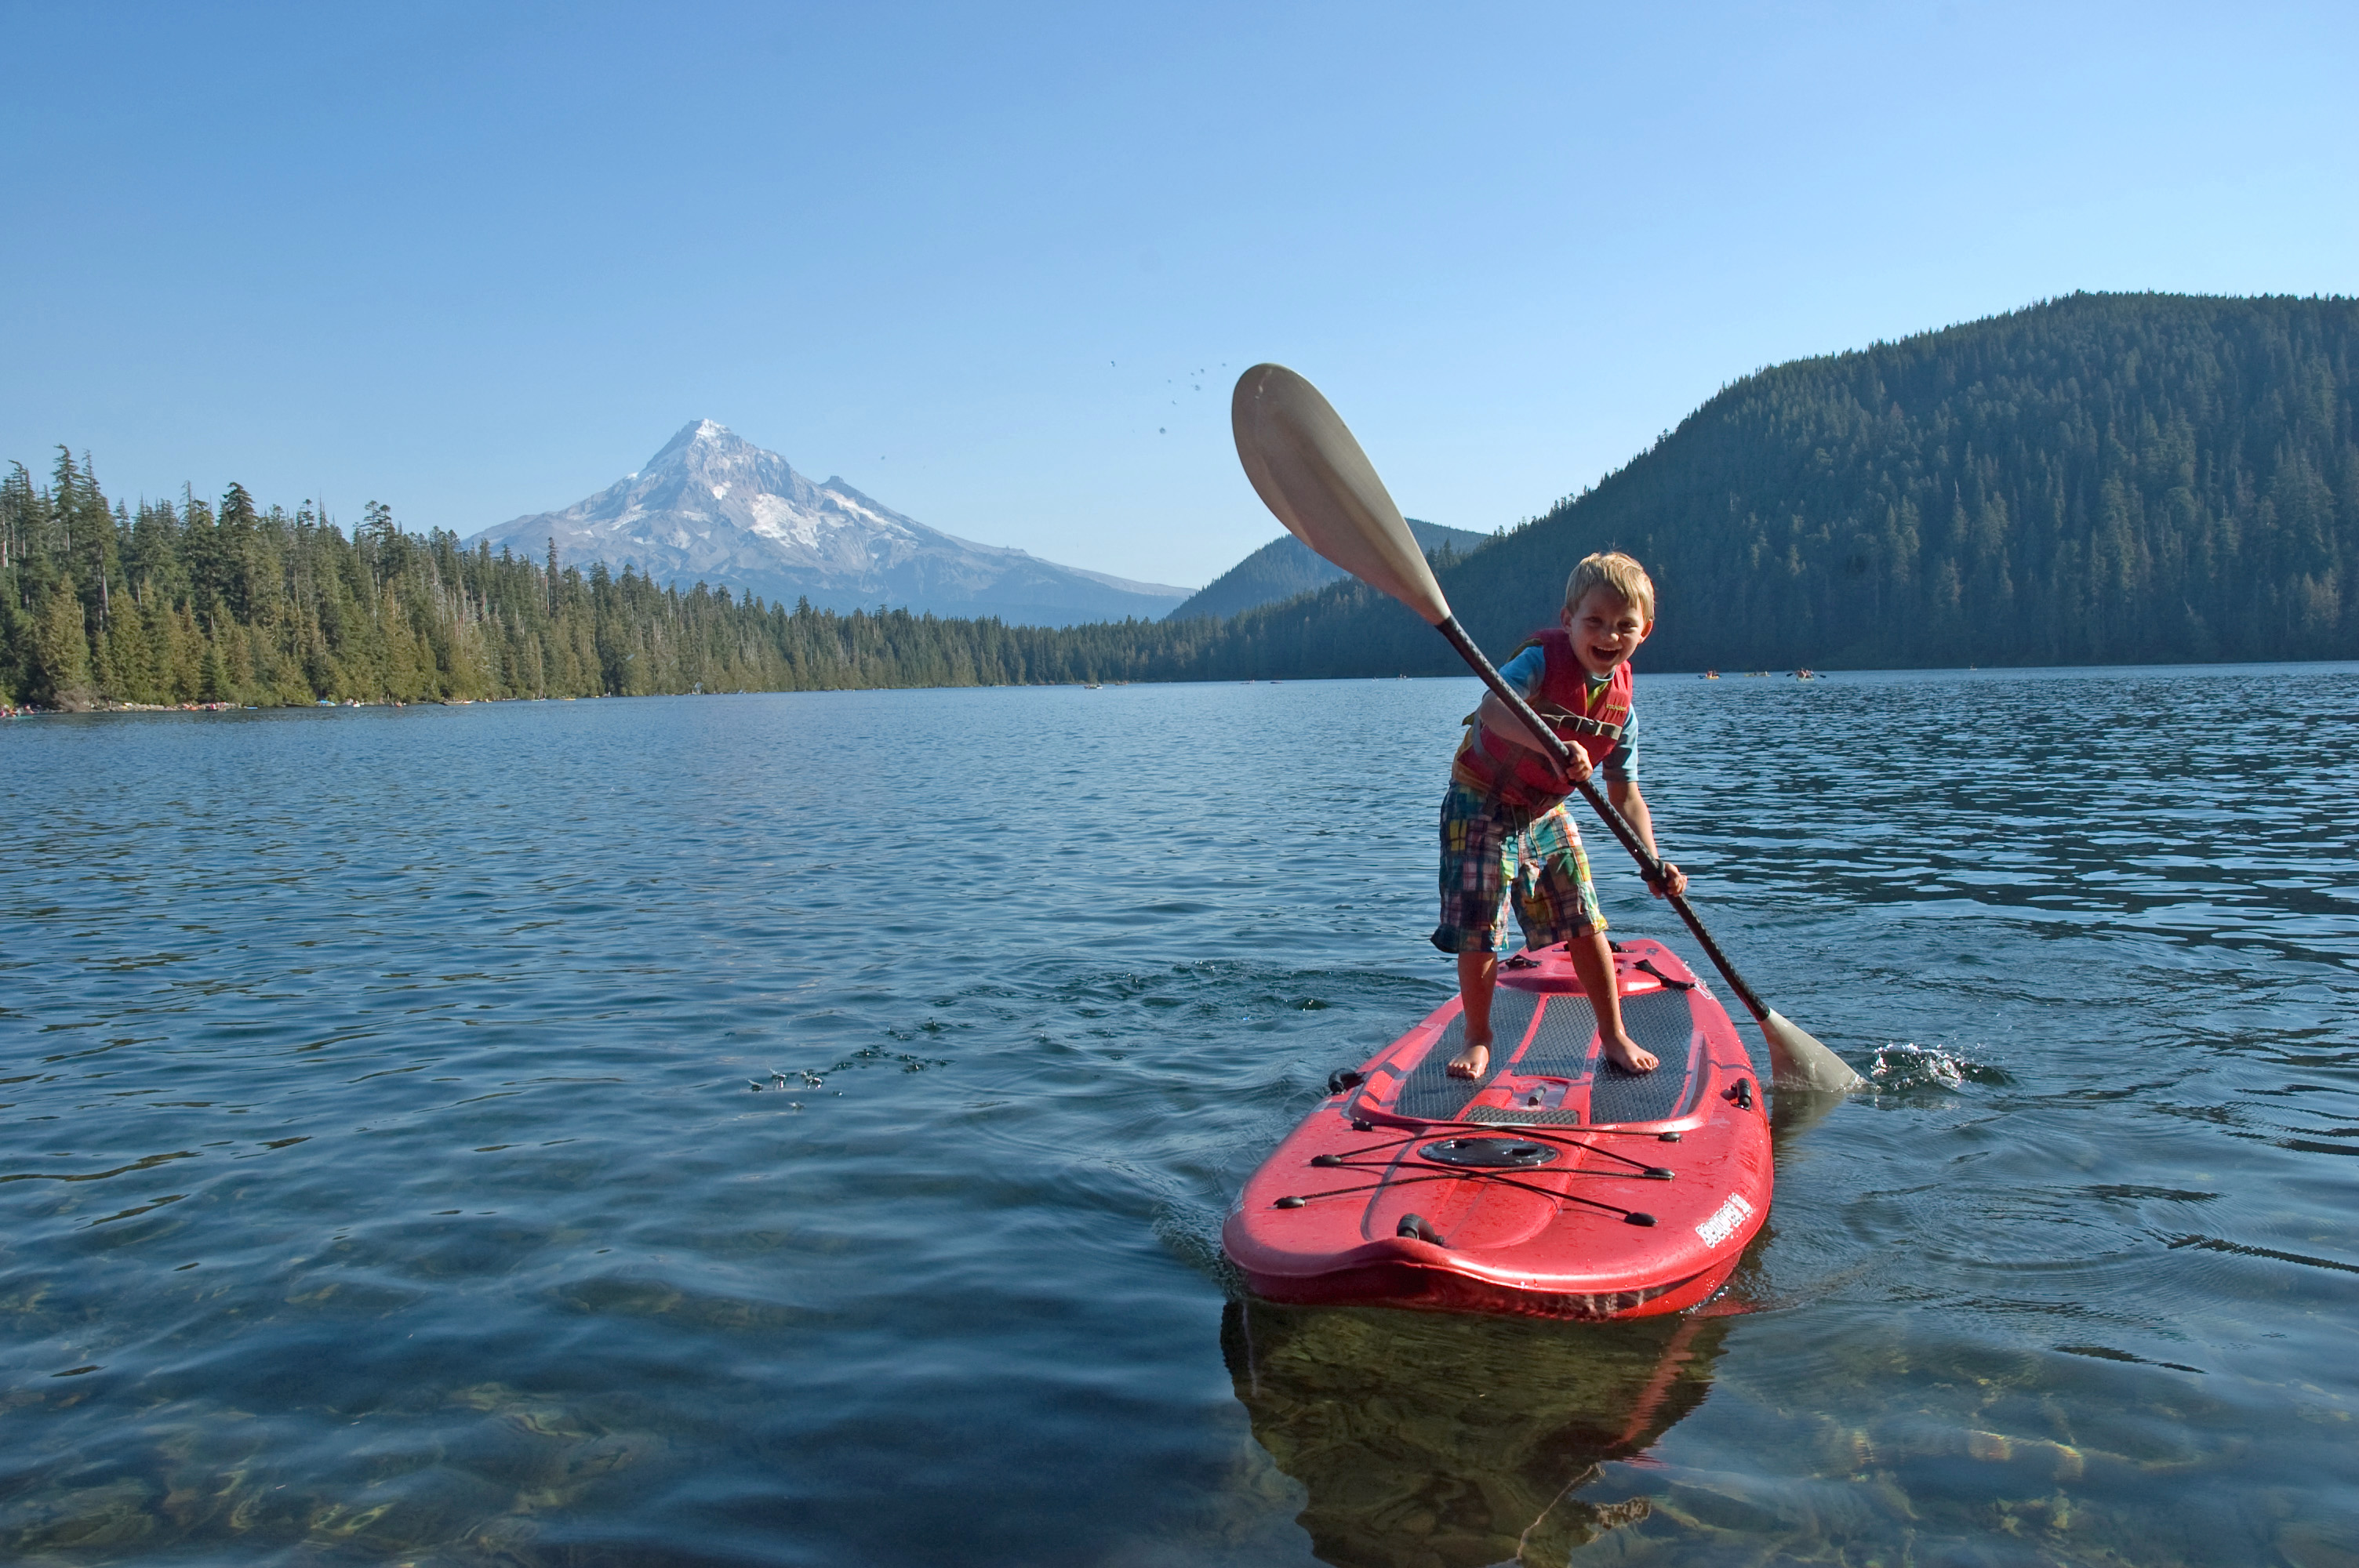 lakes | On MOUNT HOOD